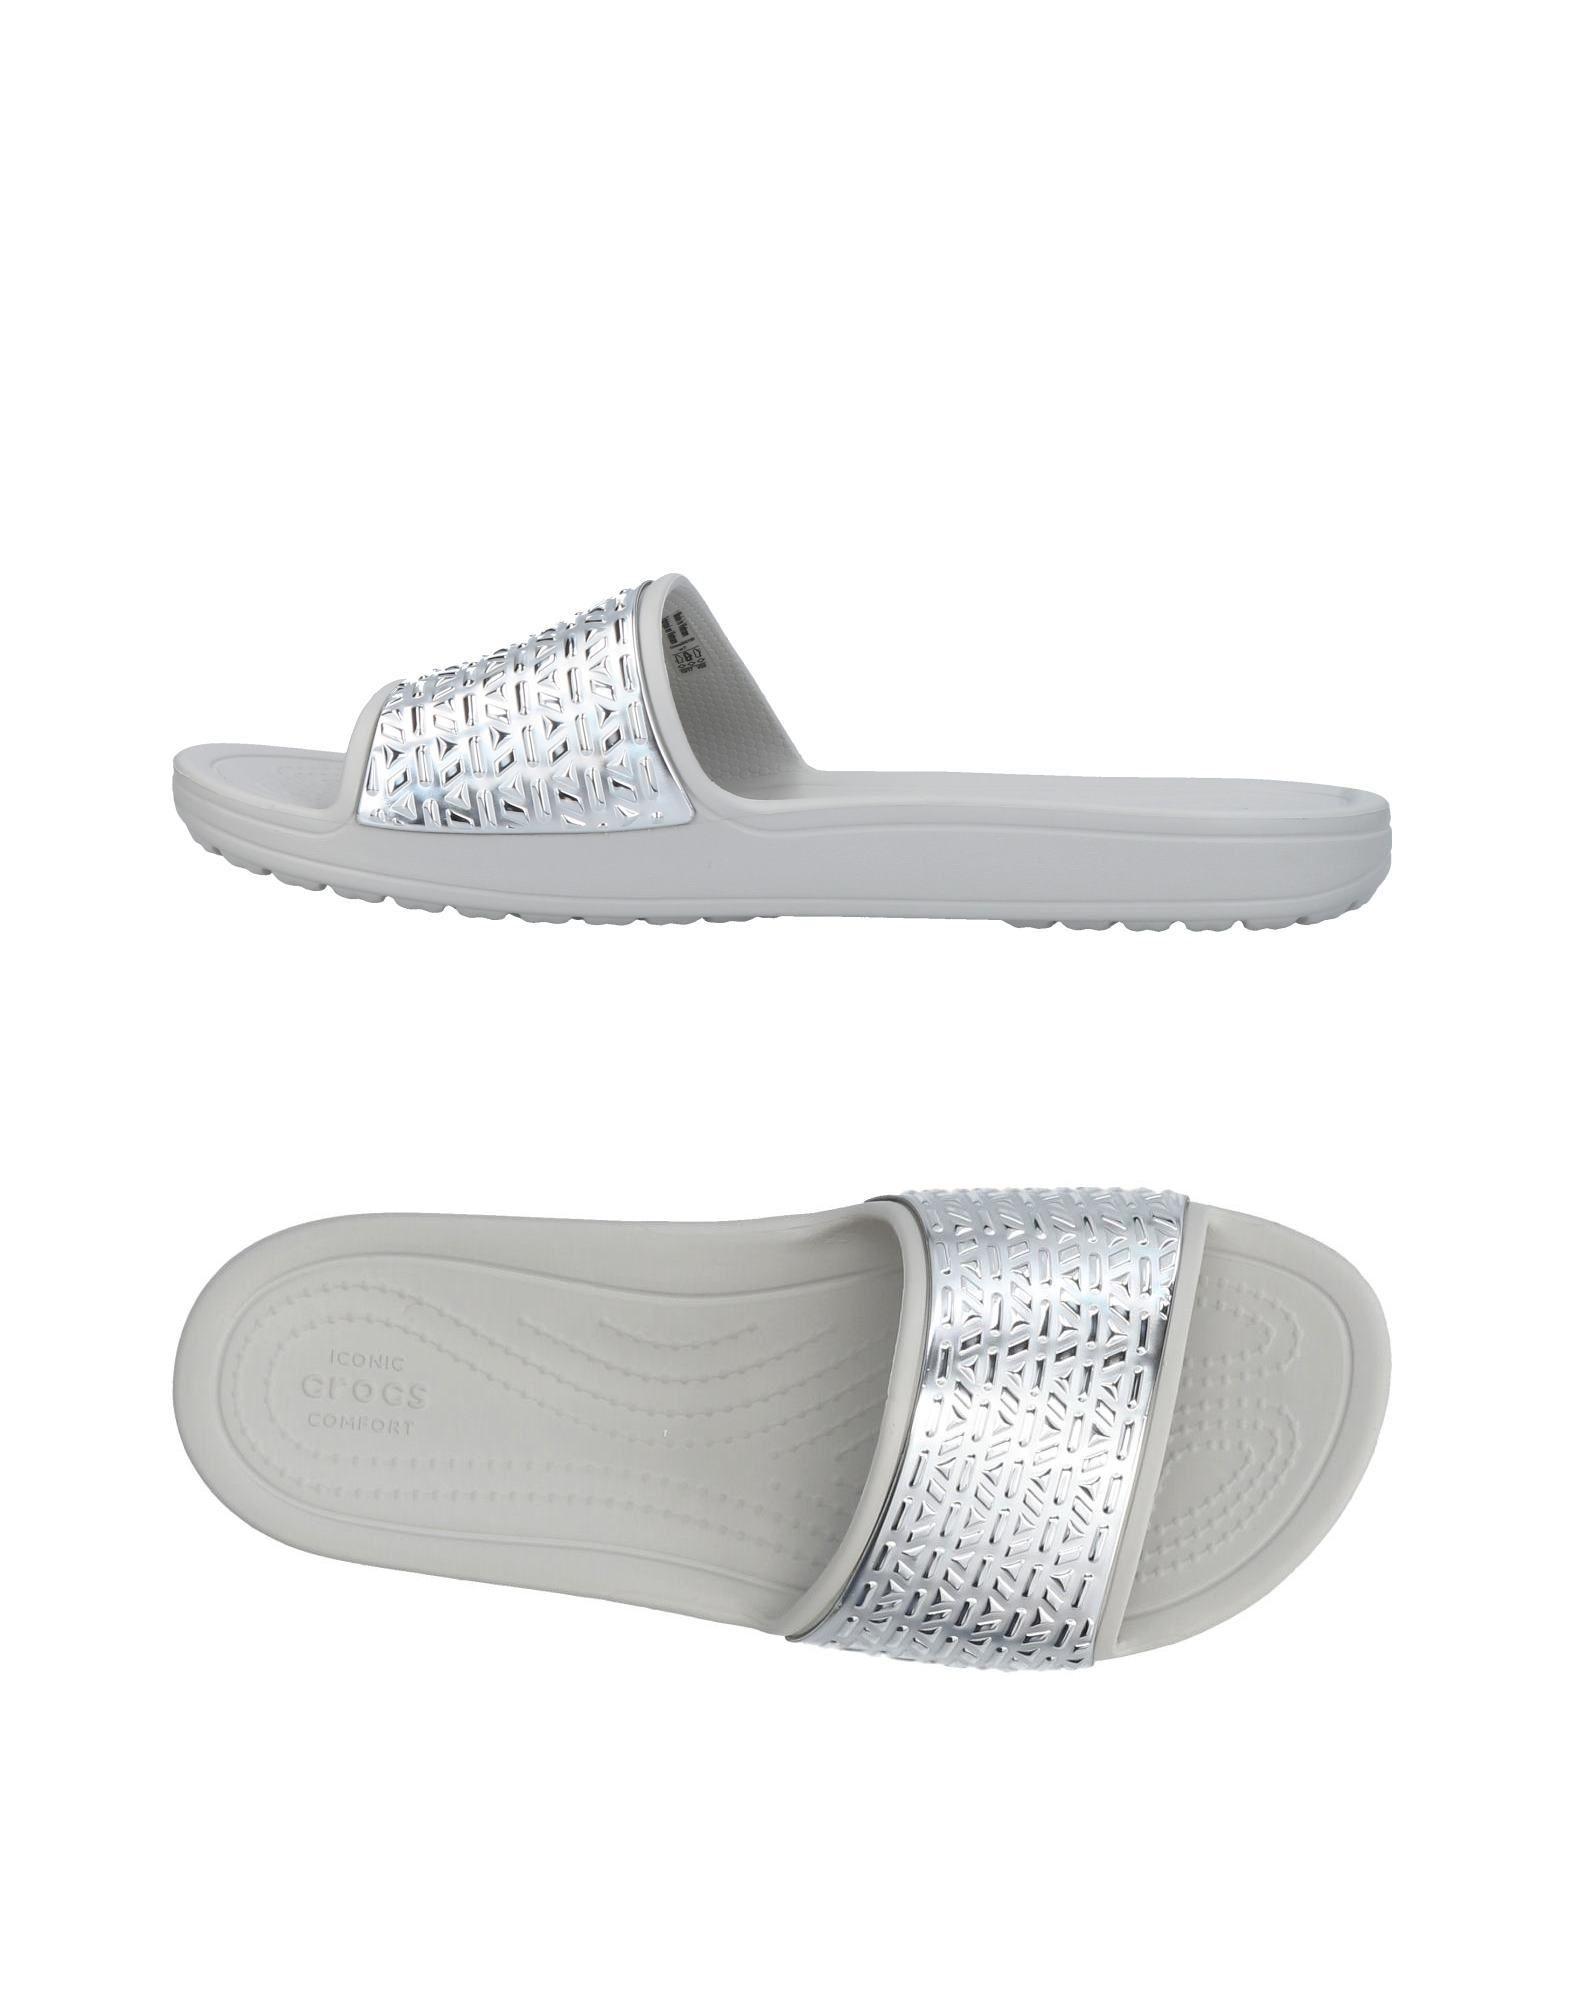 A buon mercato Sandali Crocs Donna - 11441592XP